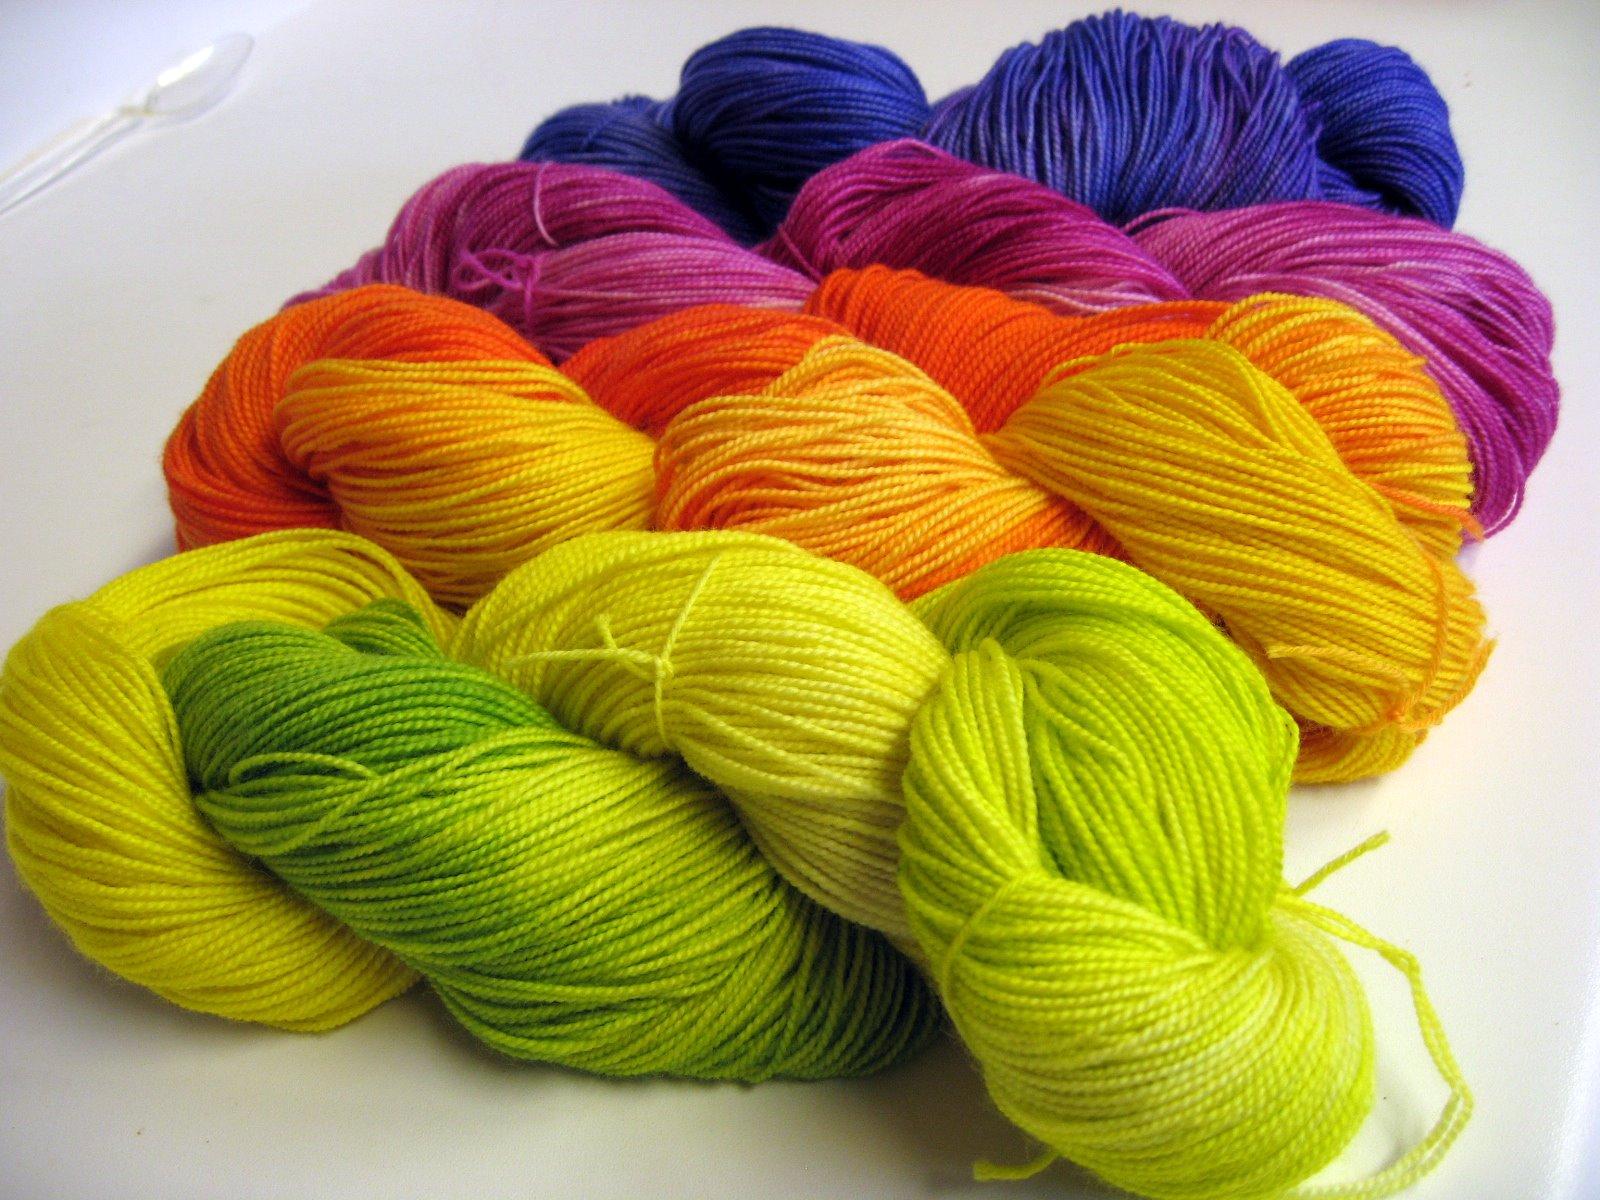 Knitting Fabric Dyeing Process : Fibermania yarn dyeing tutorial number two